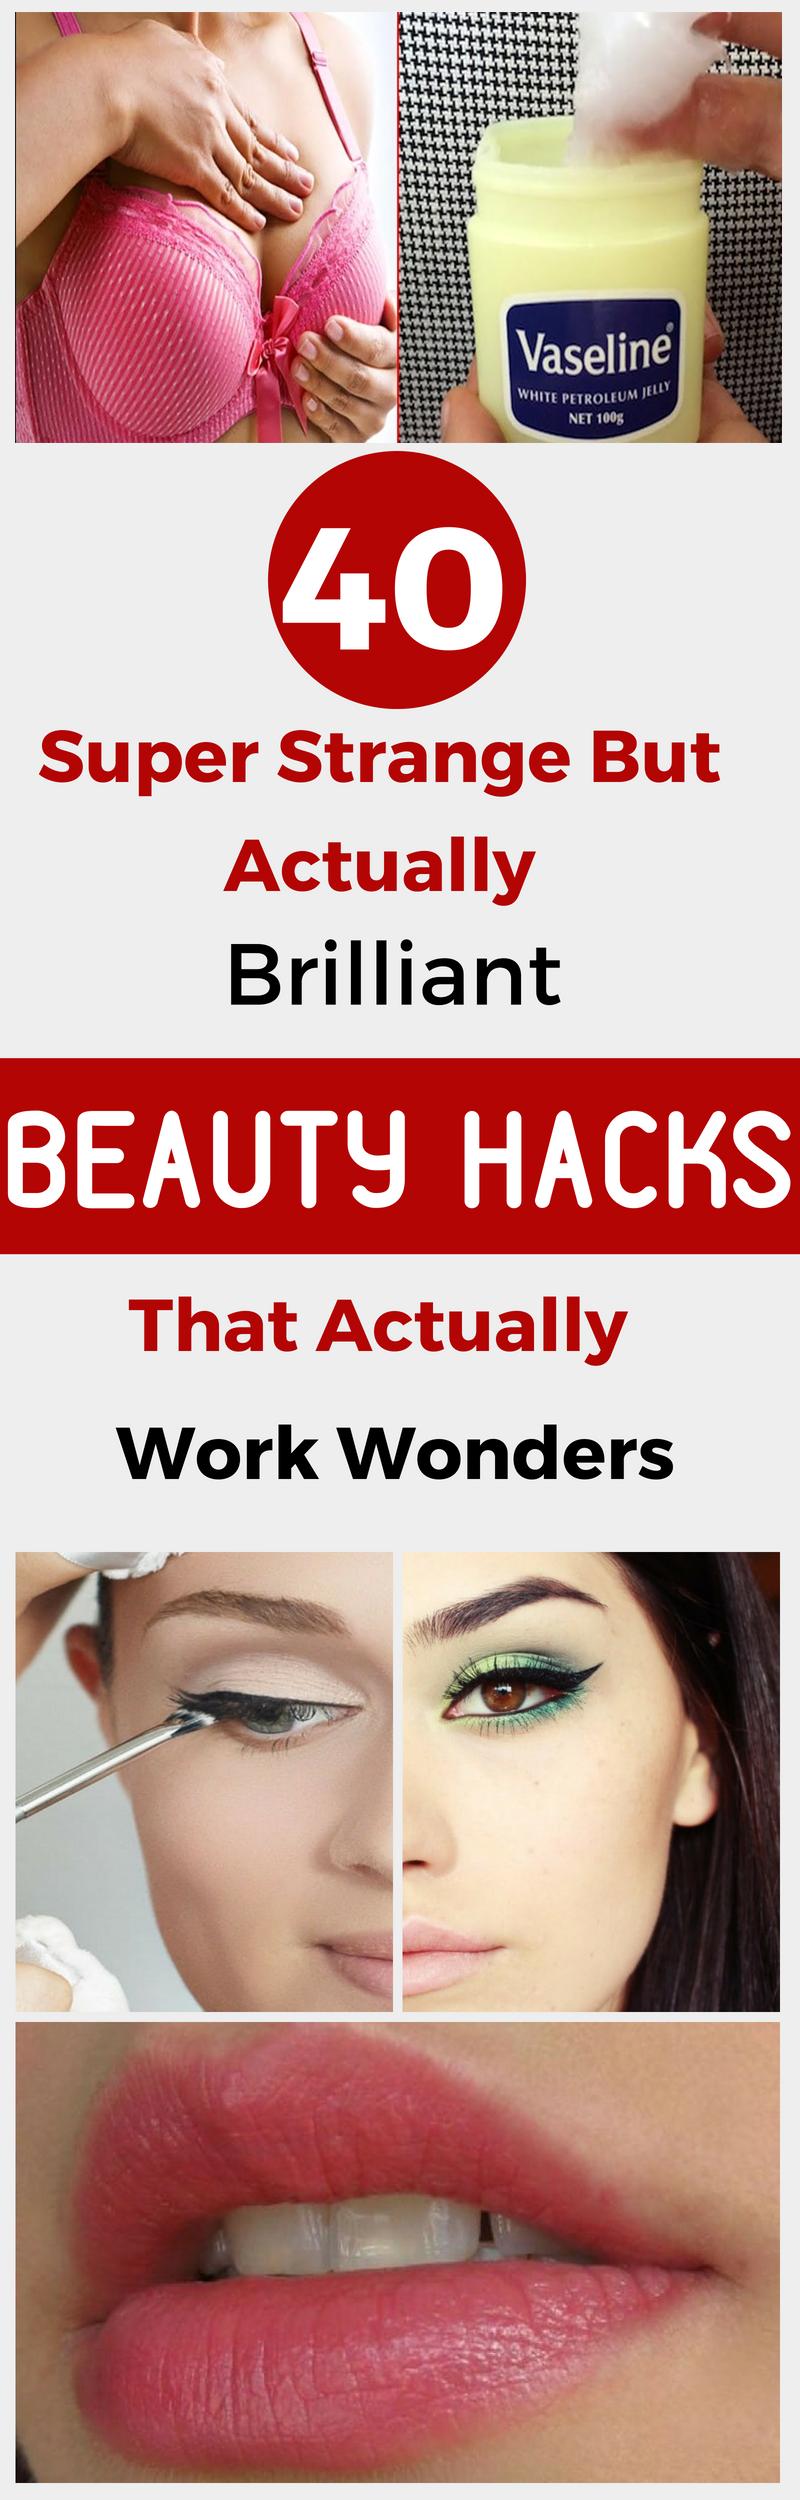 40 Super Strange But Actually Brilliant Beauty Hacks That ...